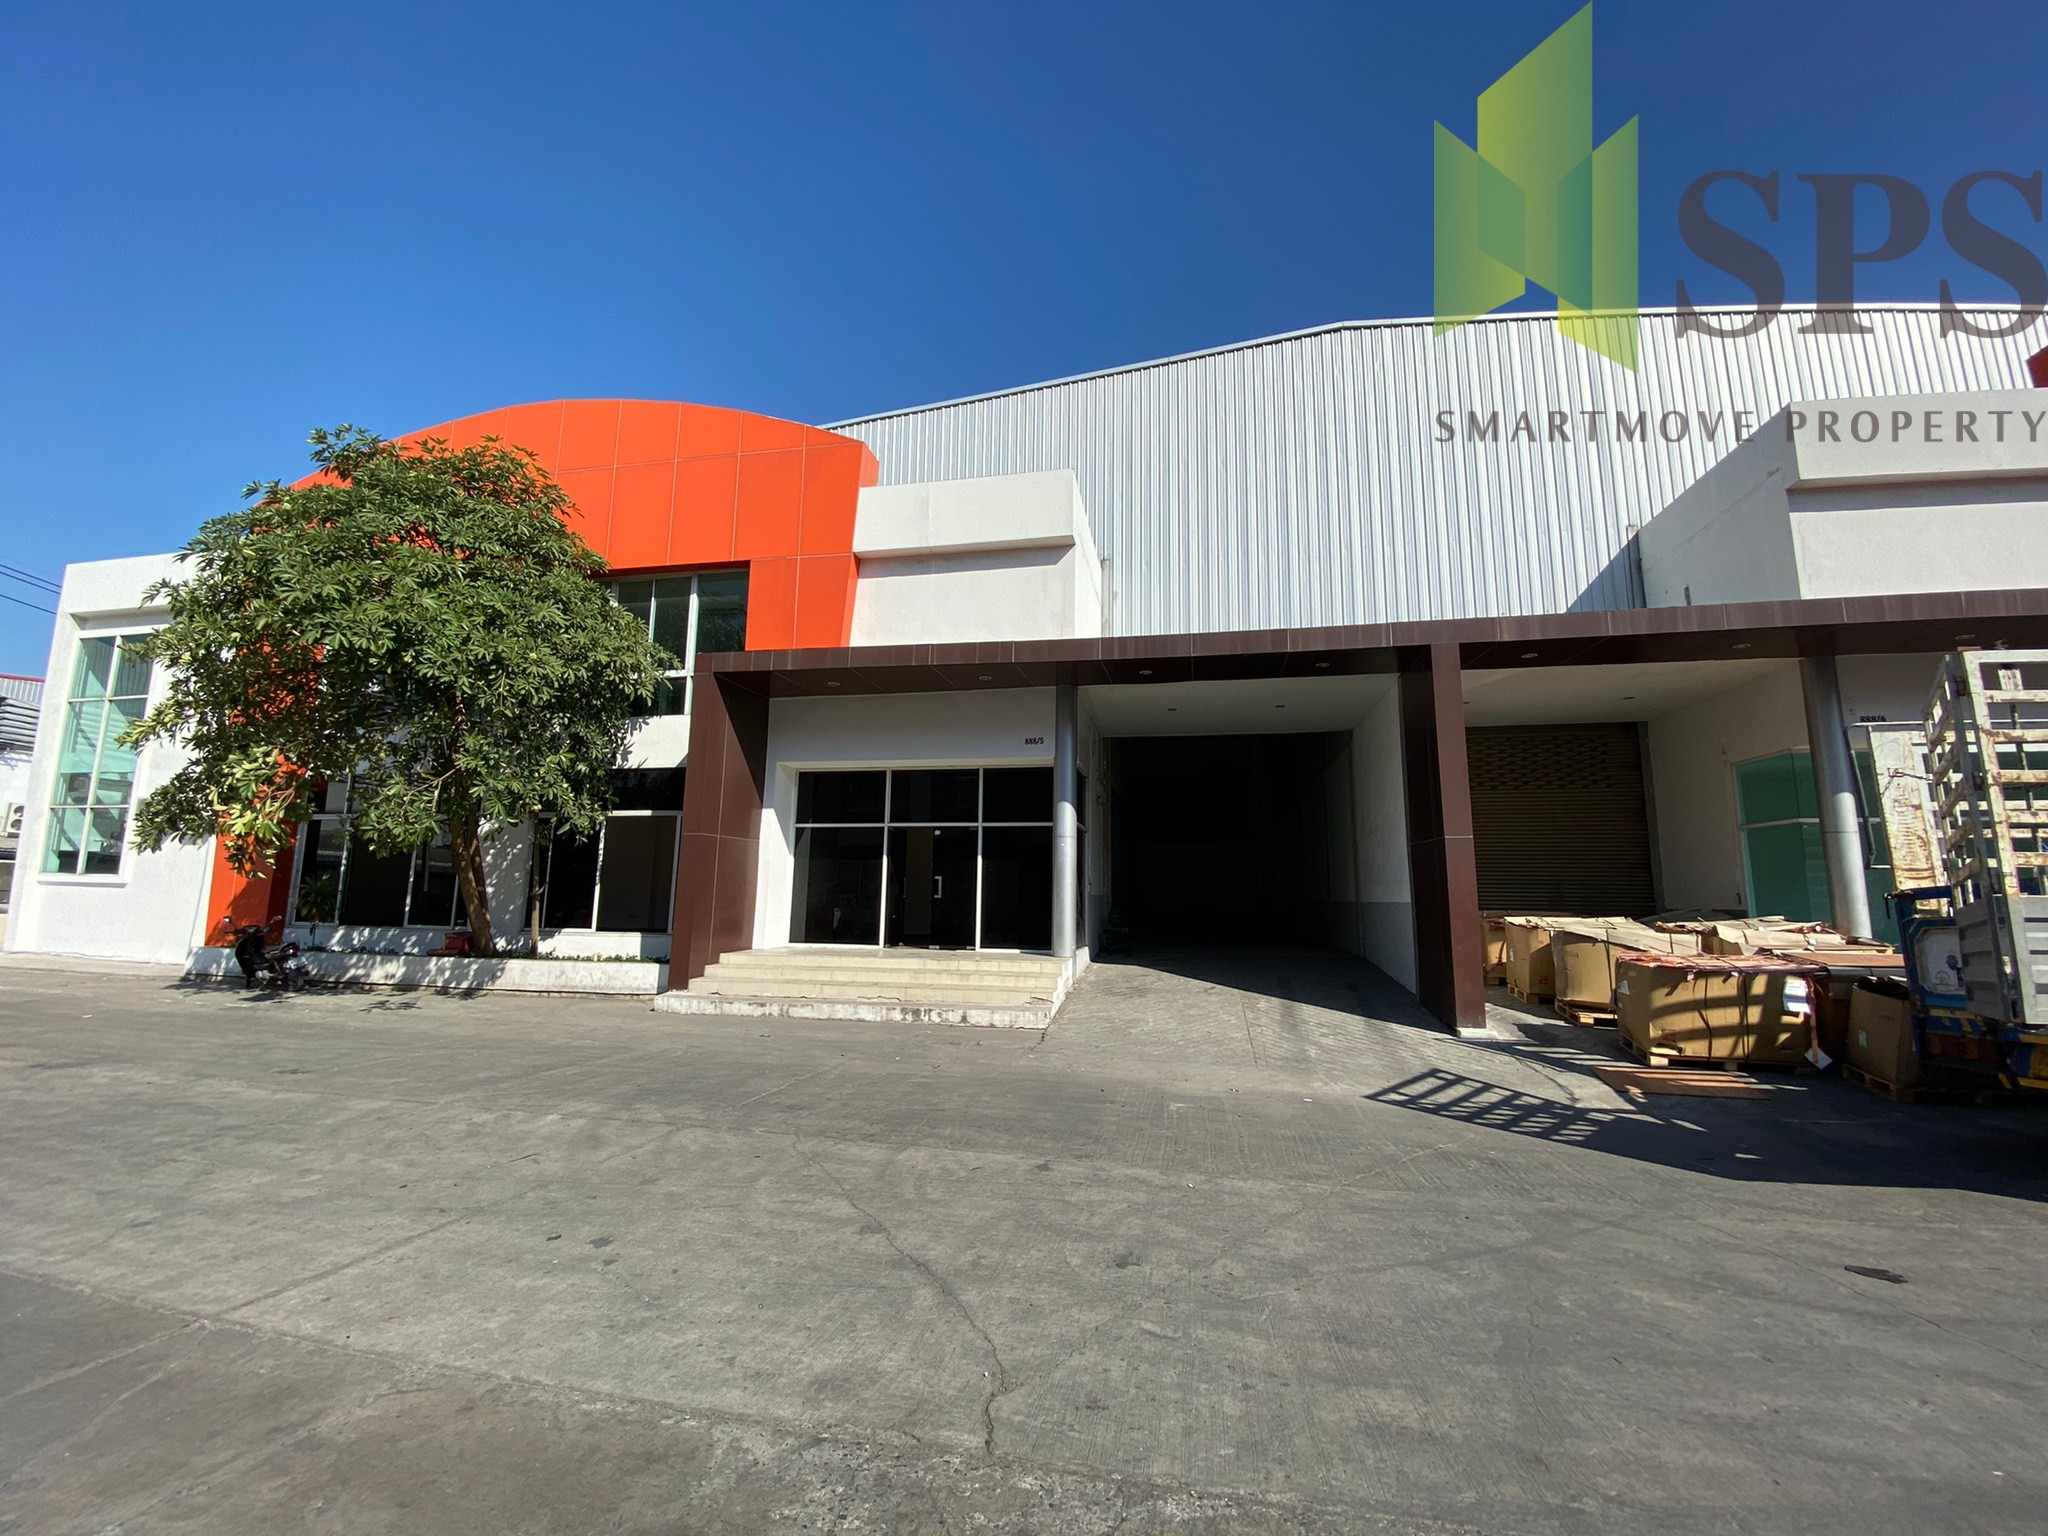 Factory, Warehouse for RENT at BangPlee-Tamru / โกดัง, โรงงานพร้อมสำนักงาน สำหรับเช่า ที่ บางพลี ตำหรุ (Property ID: SPS-PPW143)